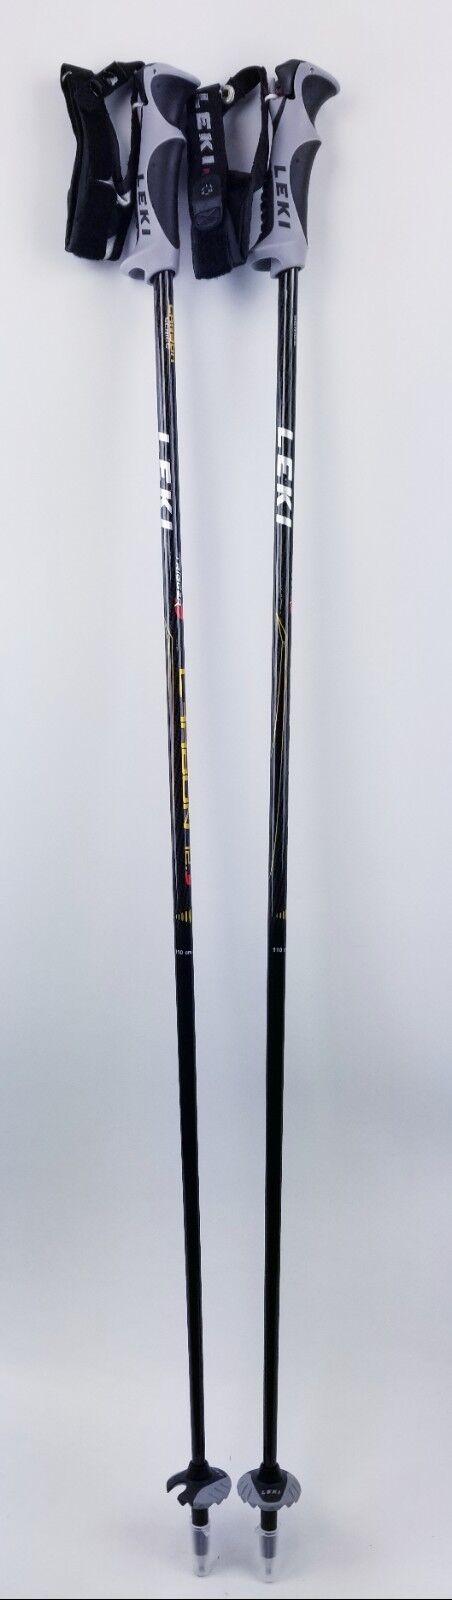 220 LEKI Carbon 12S Trigger  S Compatible Ski Poles 110CM 44  Downhill Skiing  large selection